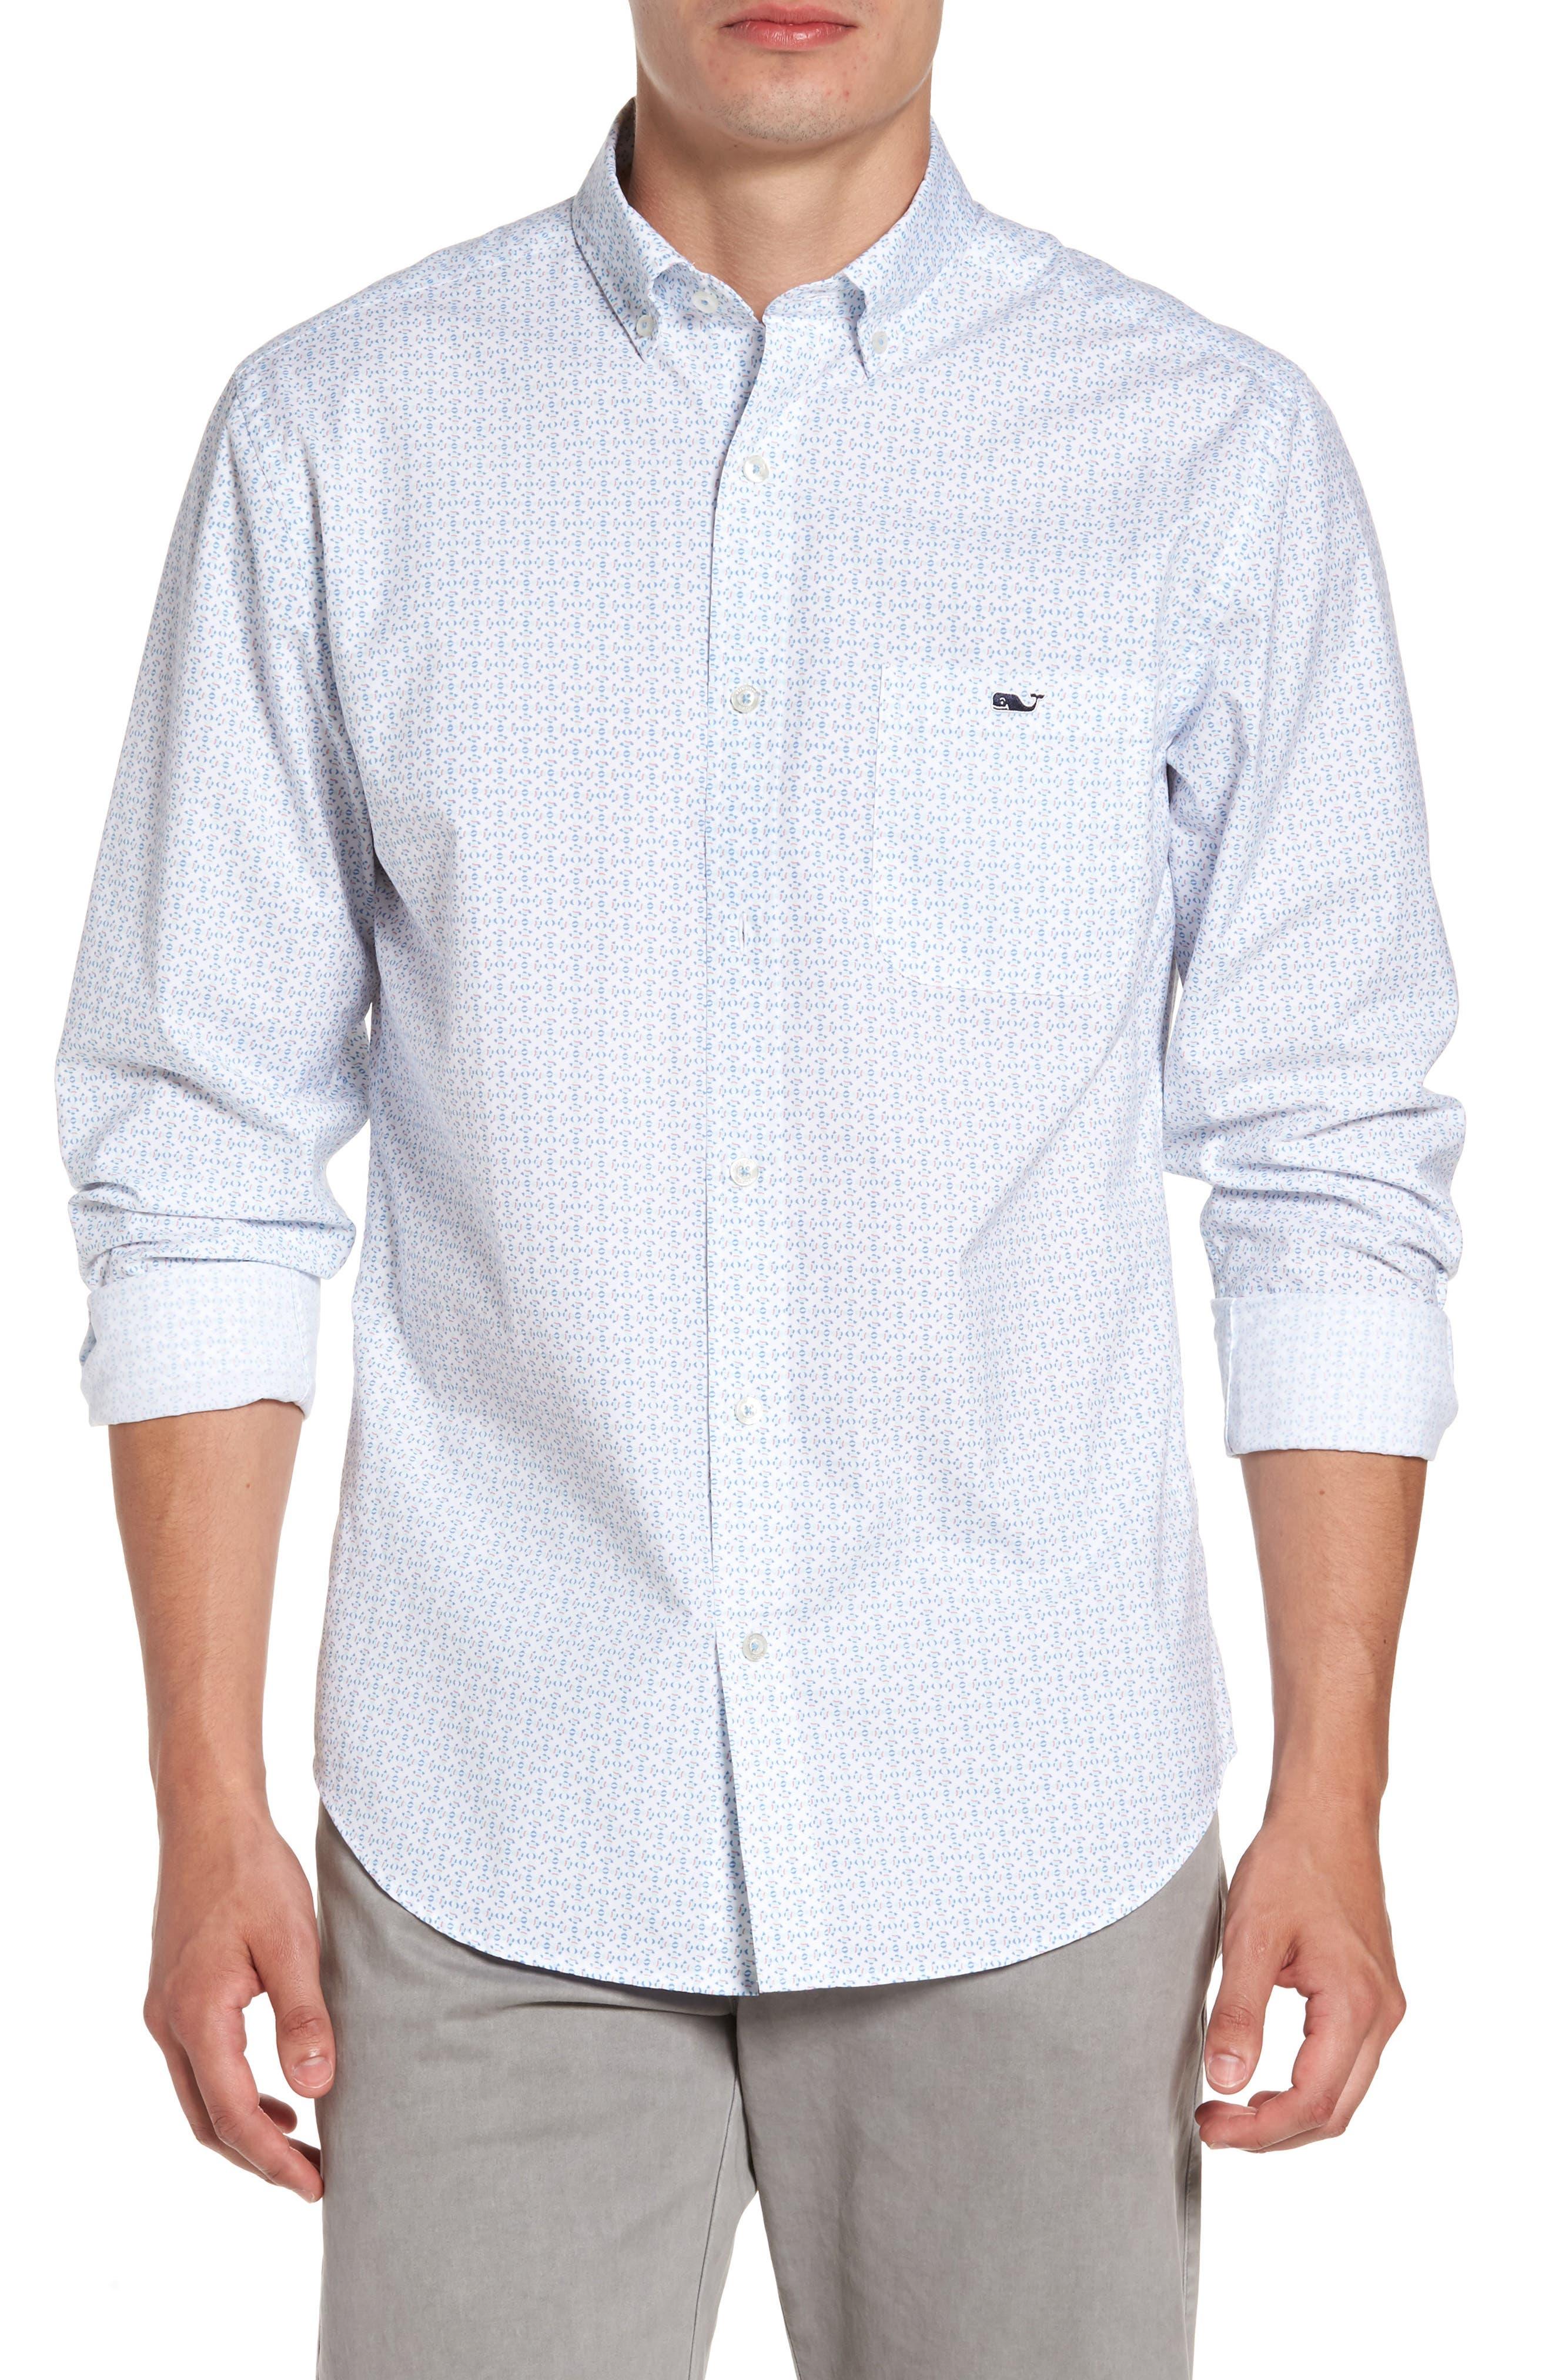 Main Image - vineyard vines Fish Check Tucker Slim Fit Sport Shirt